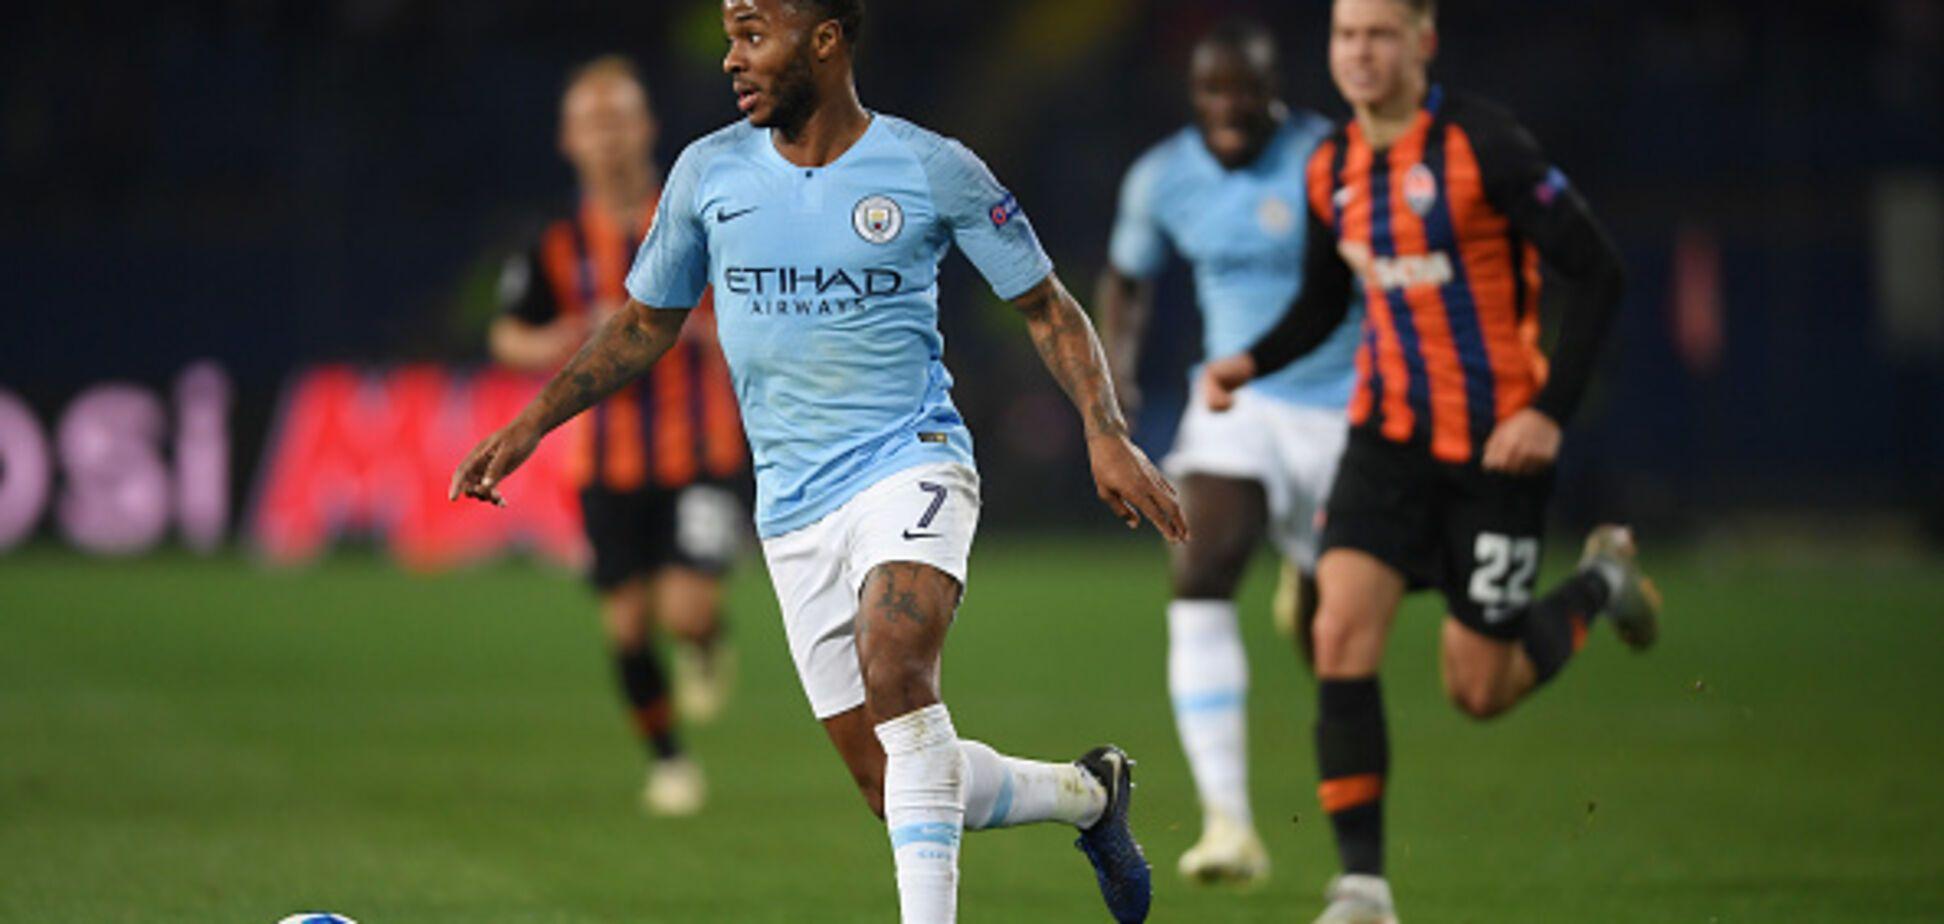 Манчестер Сити - Шахтер: прогноз на матч Лиги чемпионов